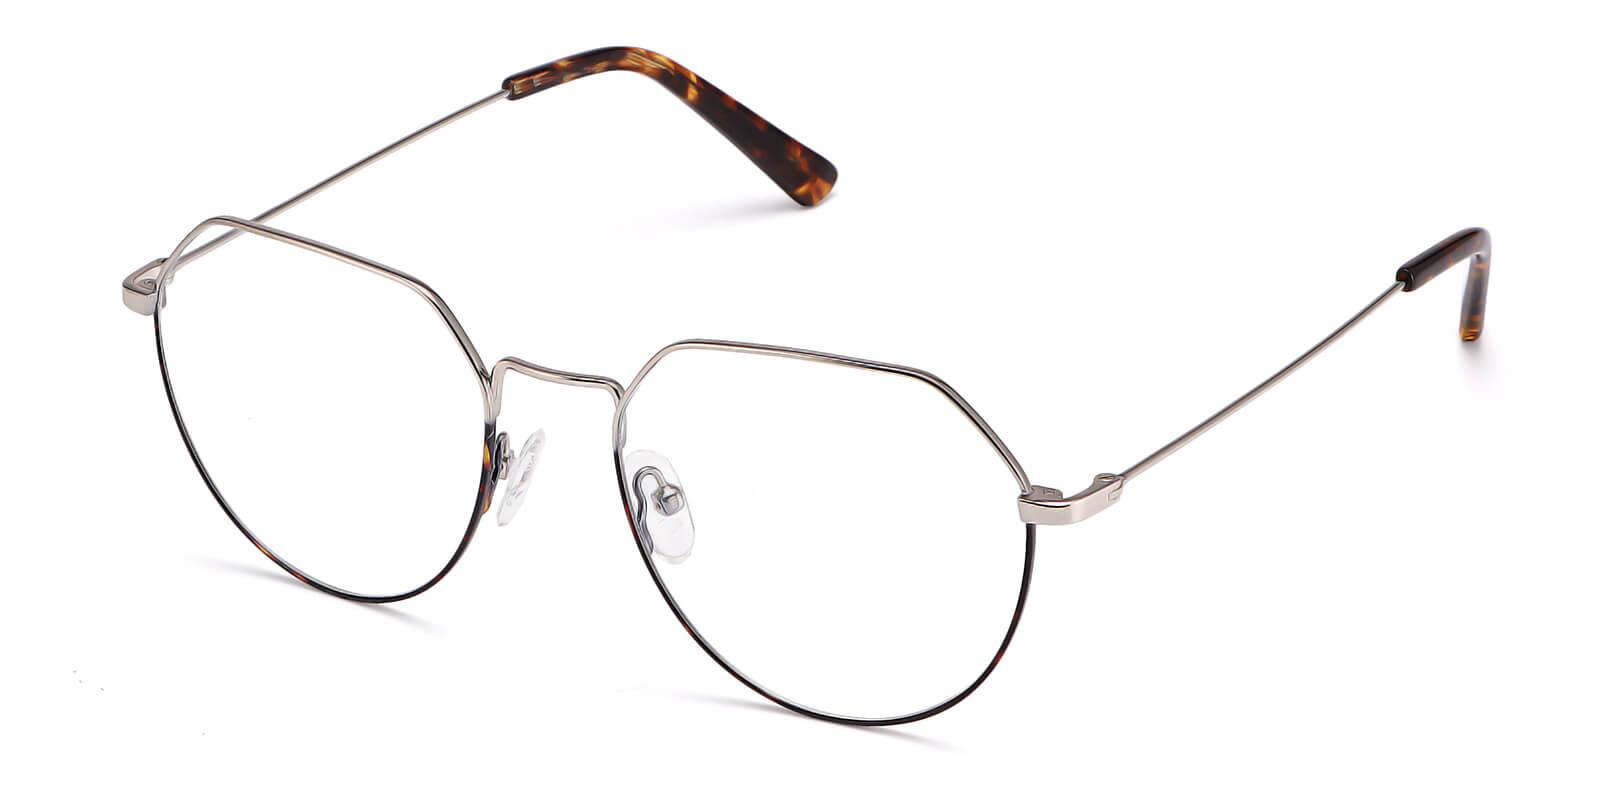 Zo-Metal glasses - lightweight metal polygonal glasses for women and men